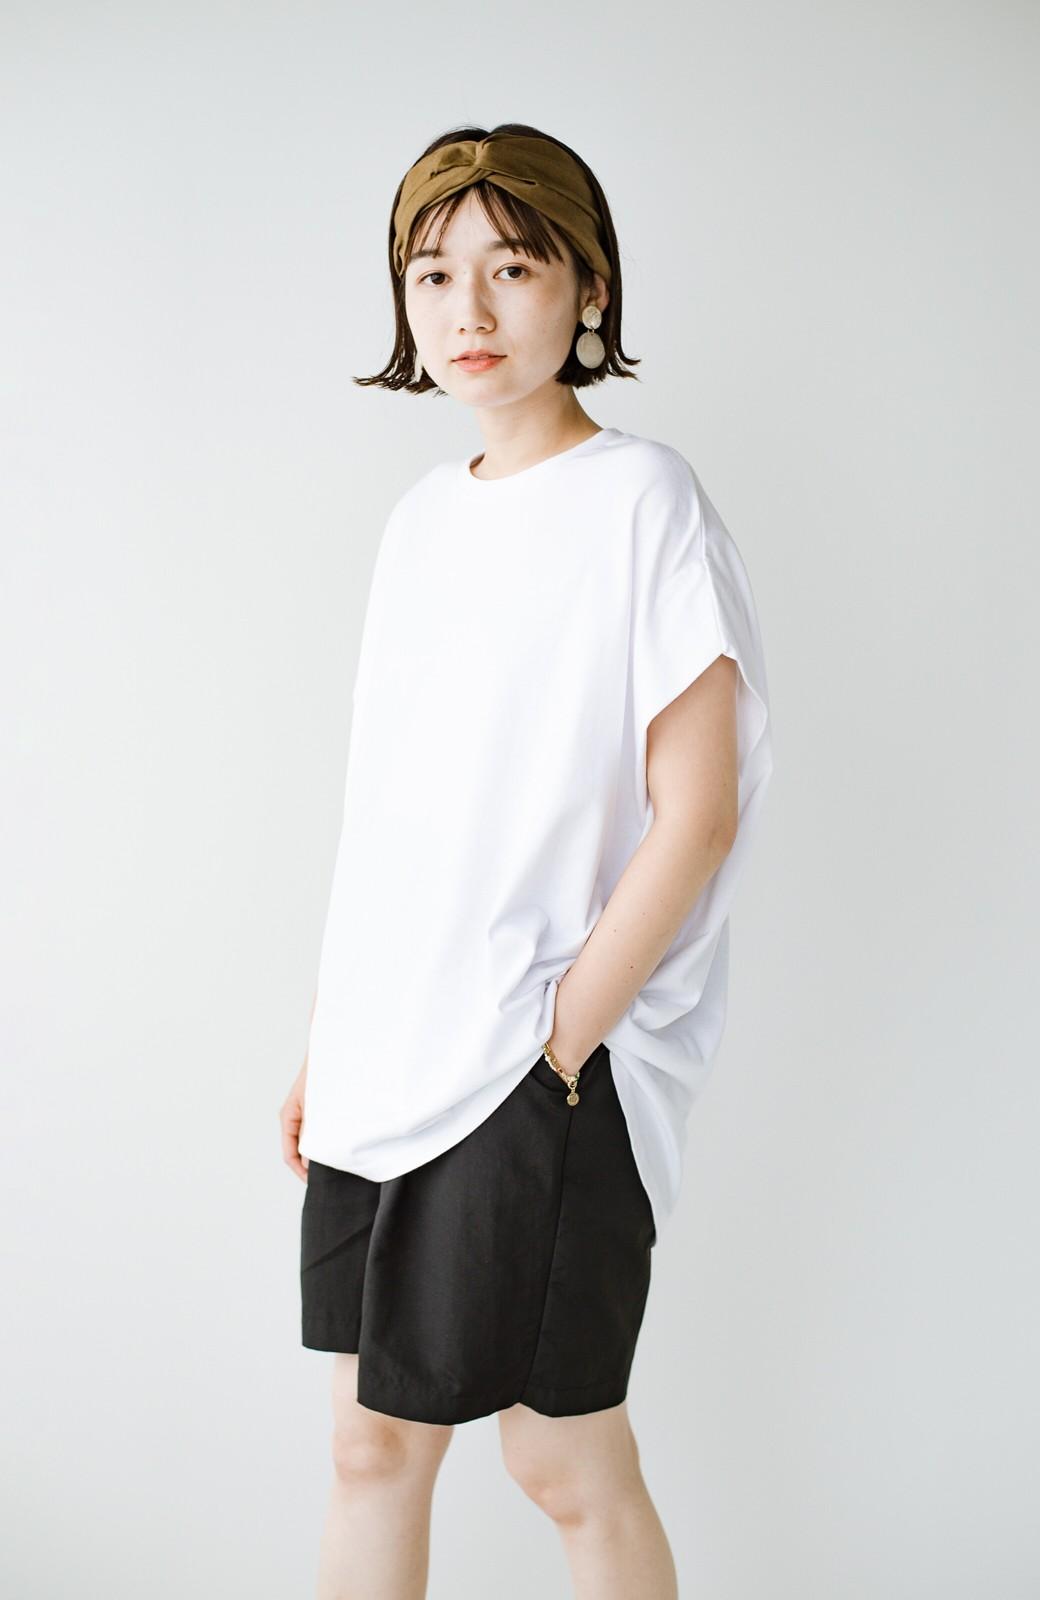 haco! PBPオーガニックコットン 楽ちんなのにブラウス気分で着られる大人のおめかしTシャツ <ホワイト>の商品写真27